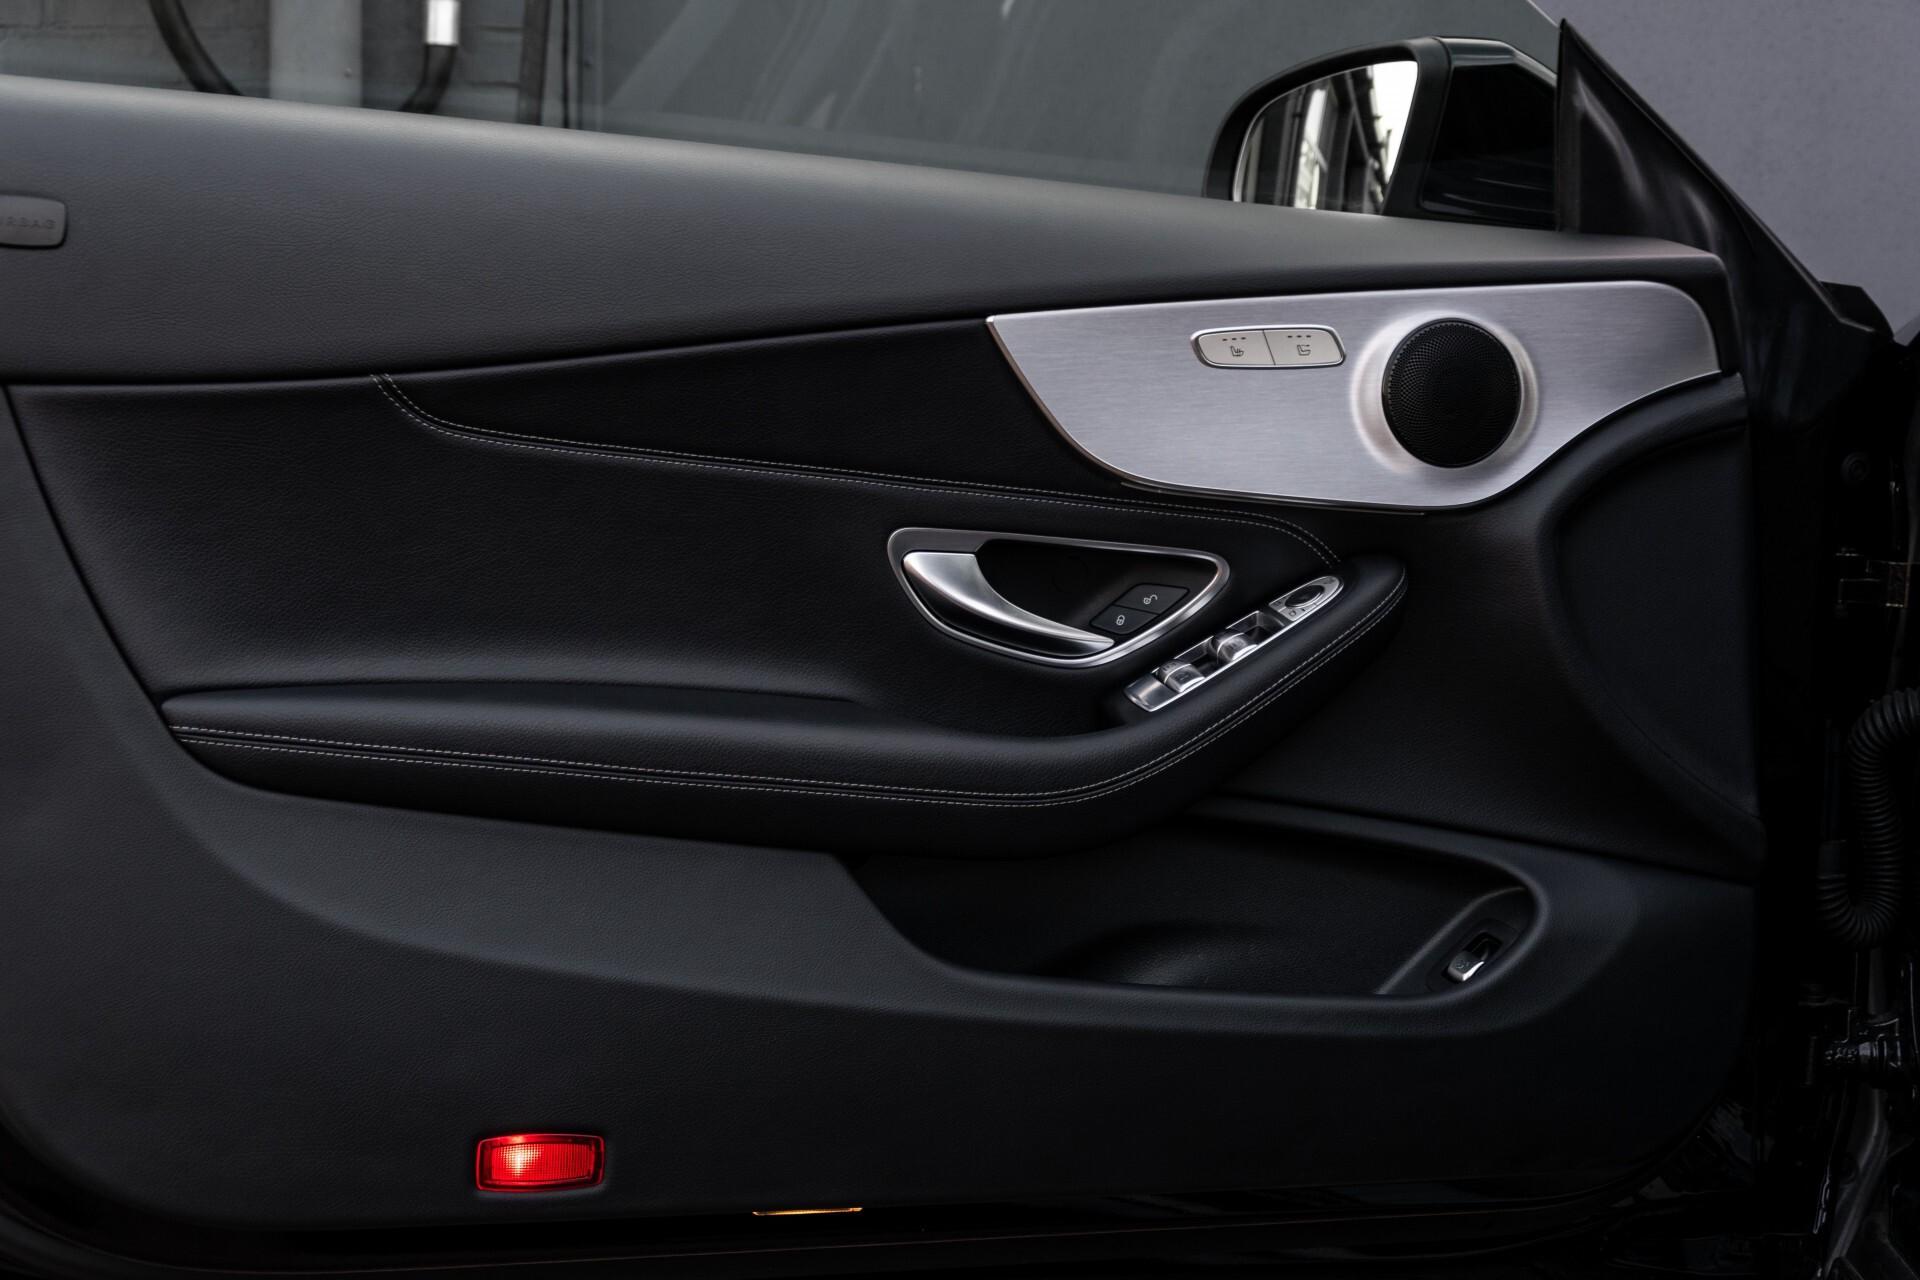 Mercedes-Benz C-Klasse Cabrio 250 AMG Airscarf/Aircap/Comand/ILS/Camera/Rode cabriokap Aut9 Foto 18